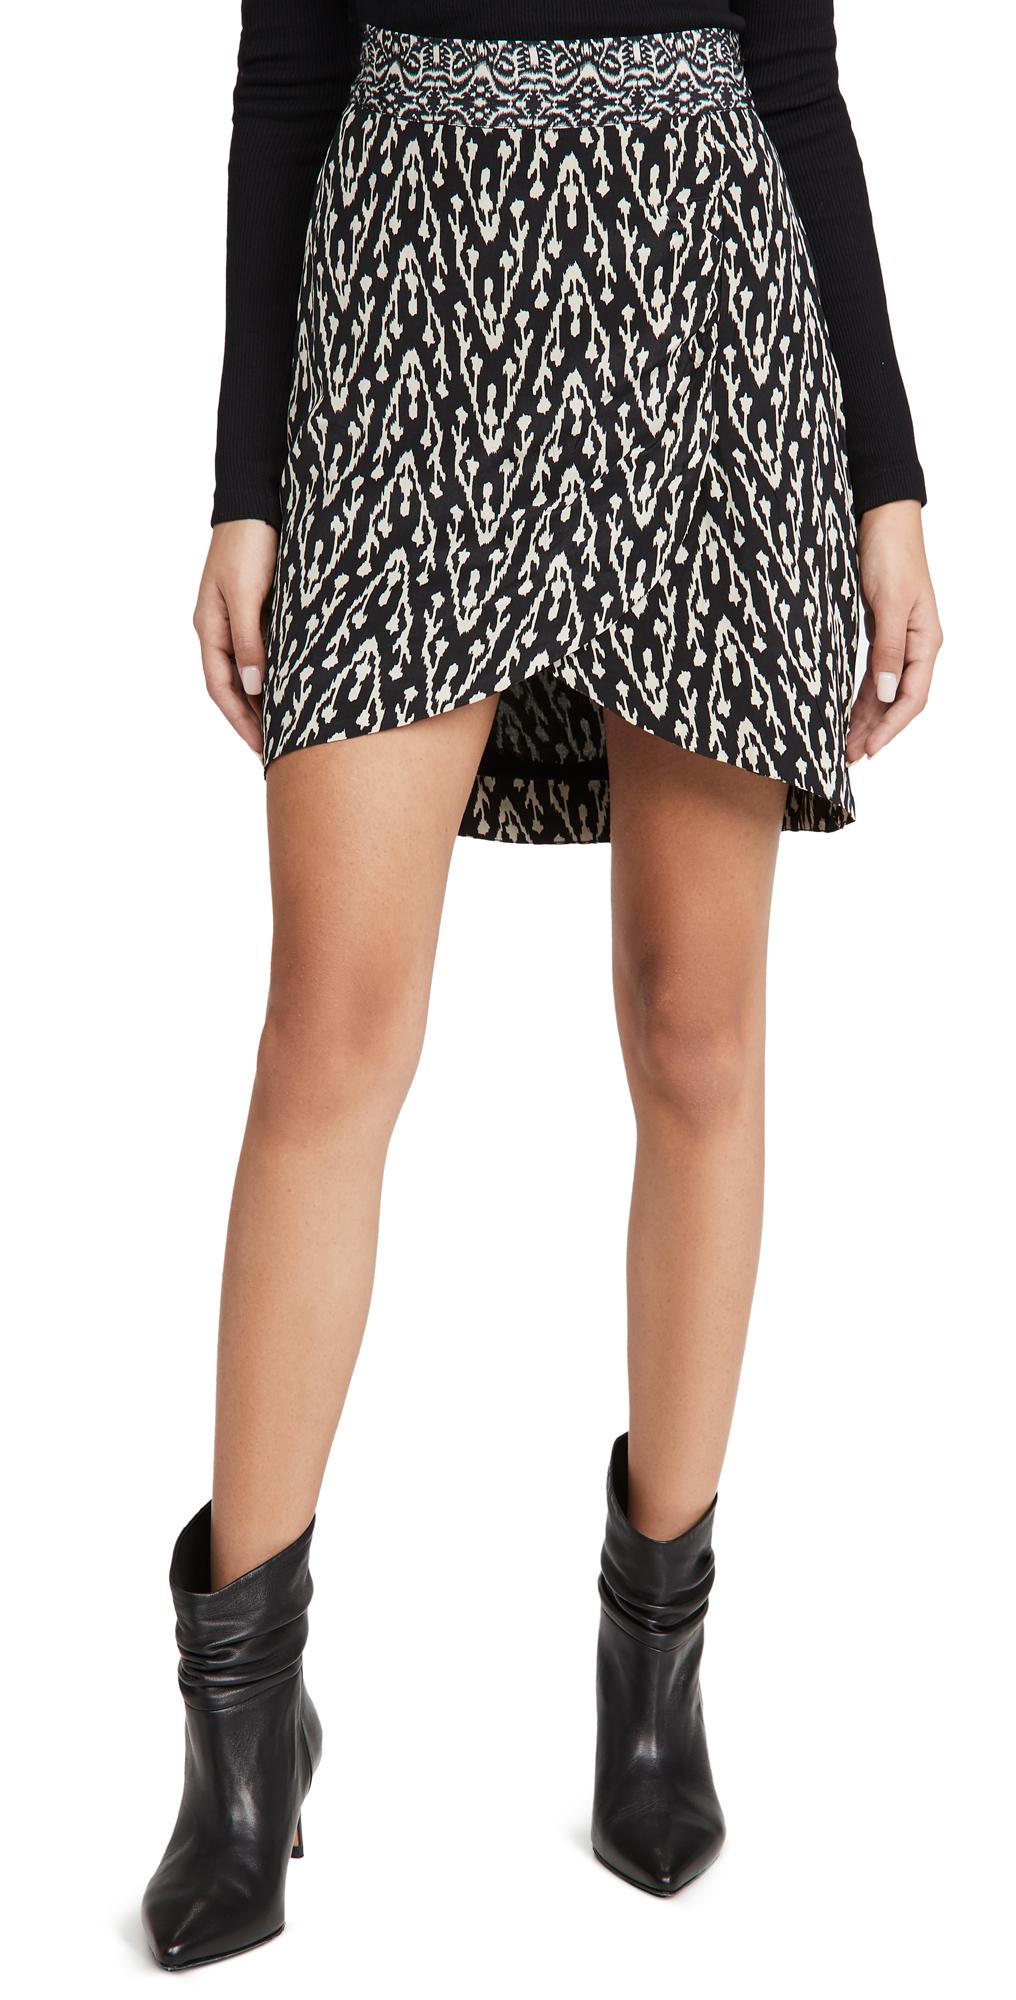 Ba & sh Iliade Skirt